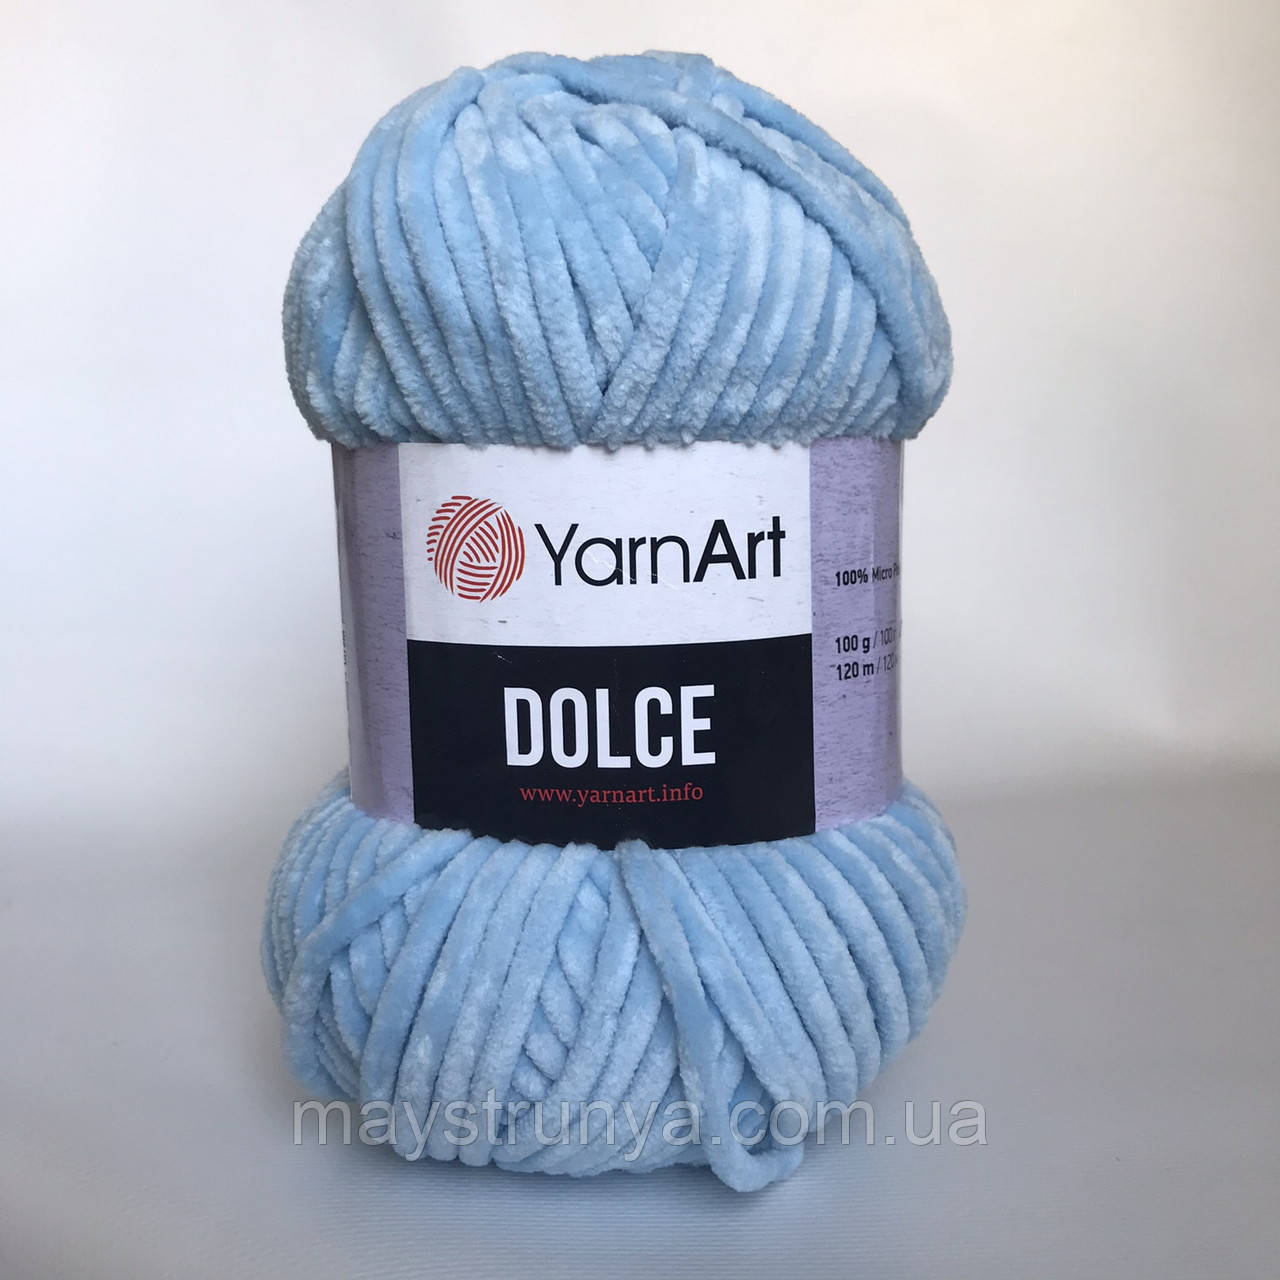 Плюшева пряжа YarnArt Dolce 749 (ЯрнАрт Дольче) Блакитний